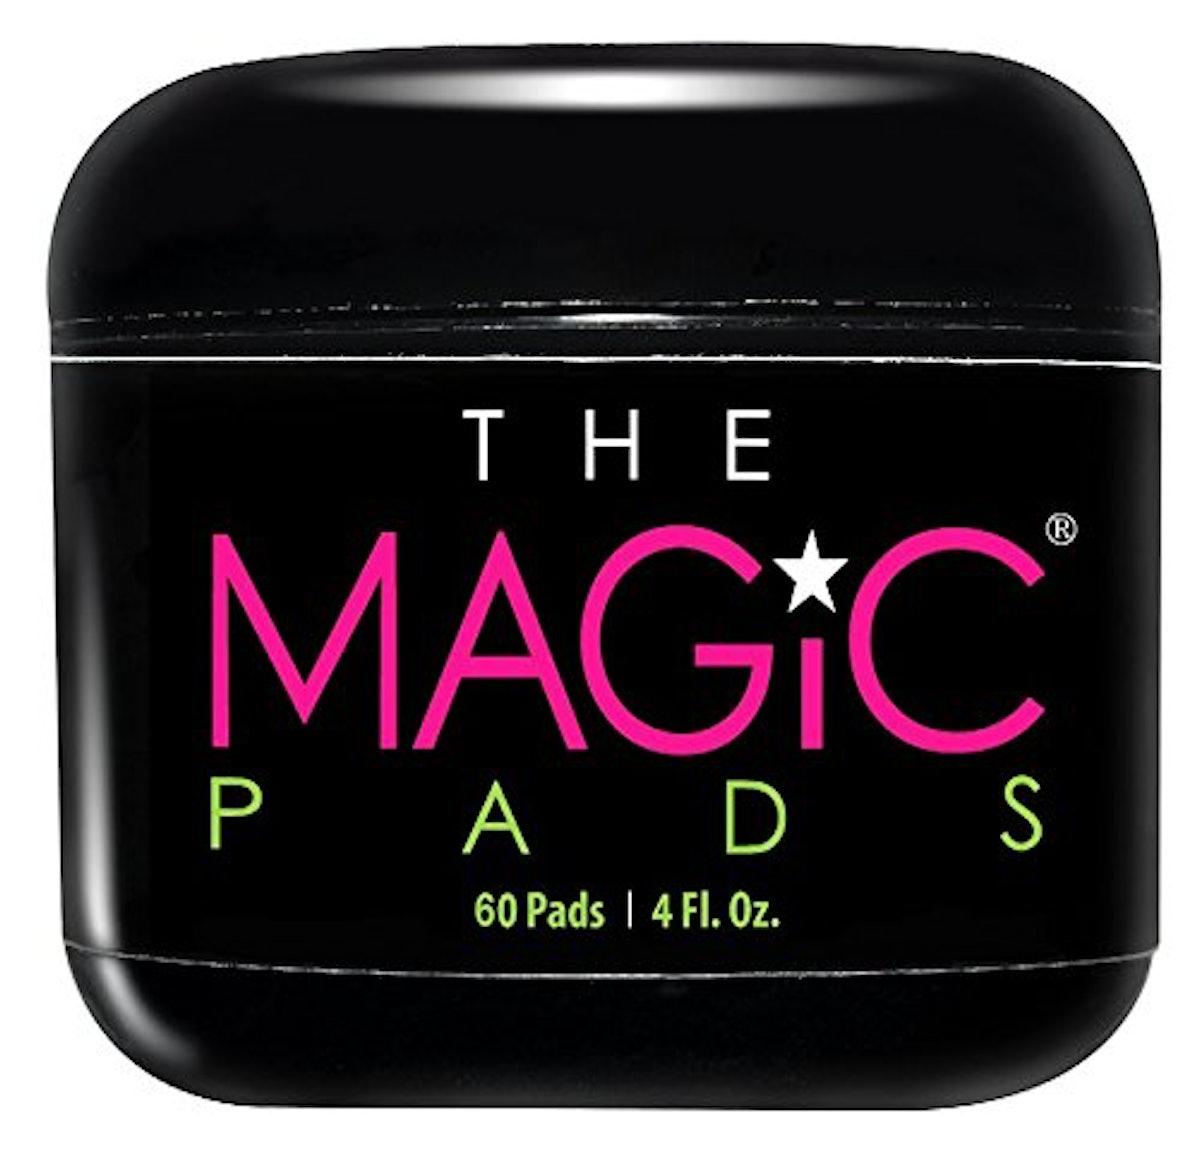 The Magic Pads